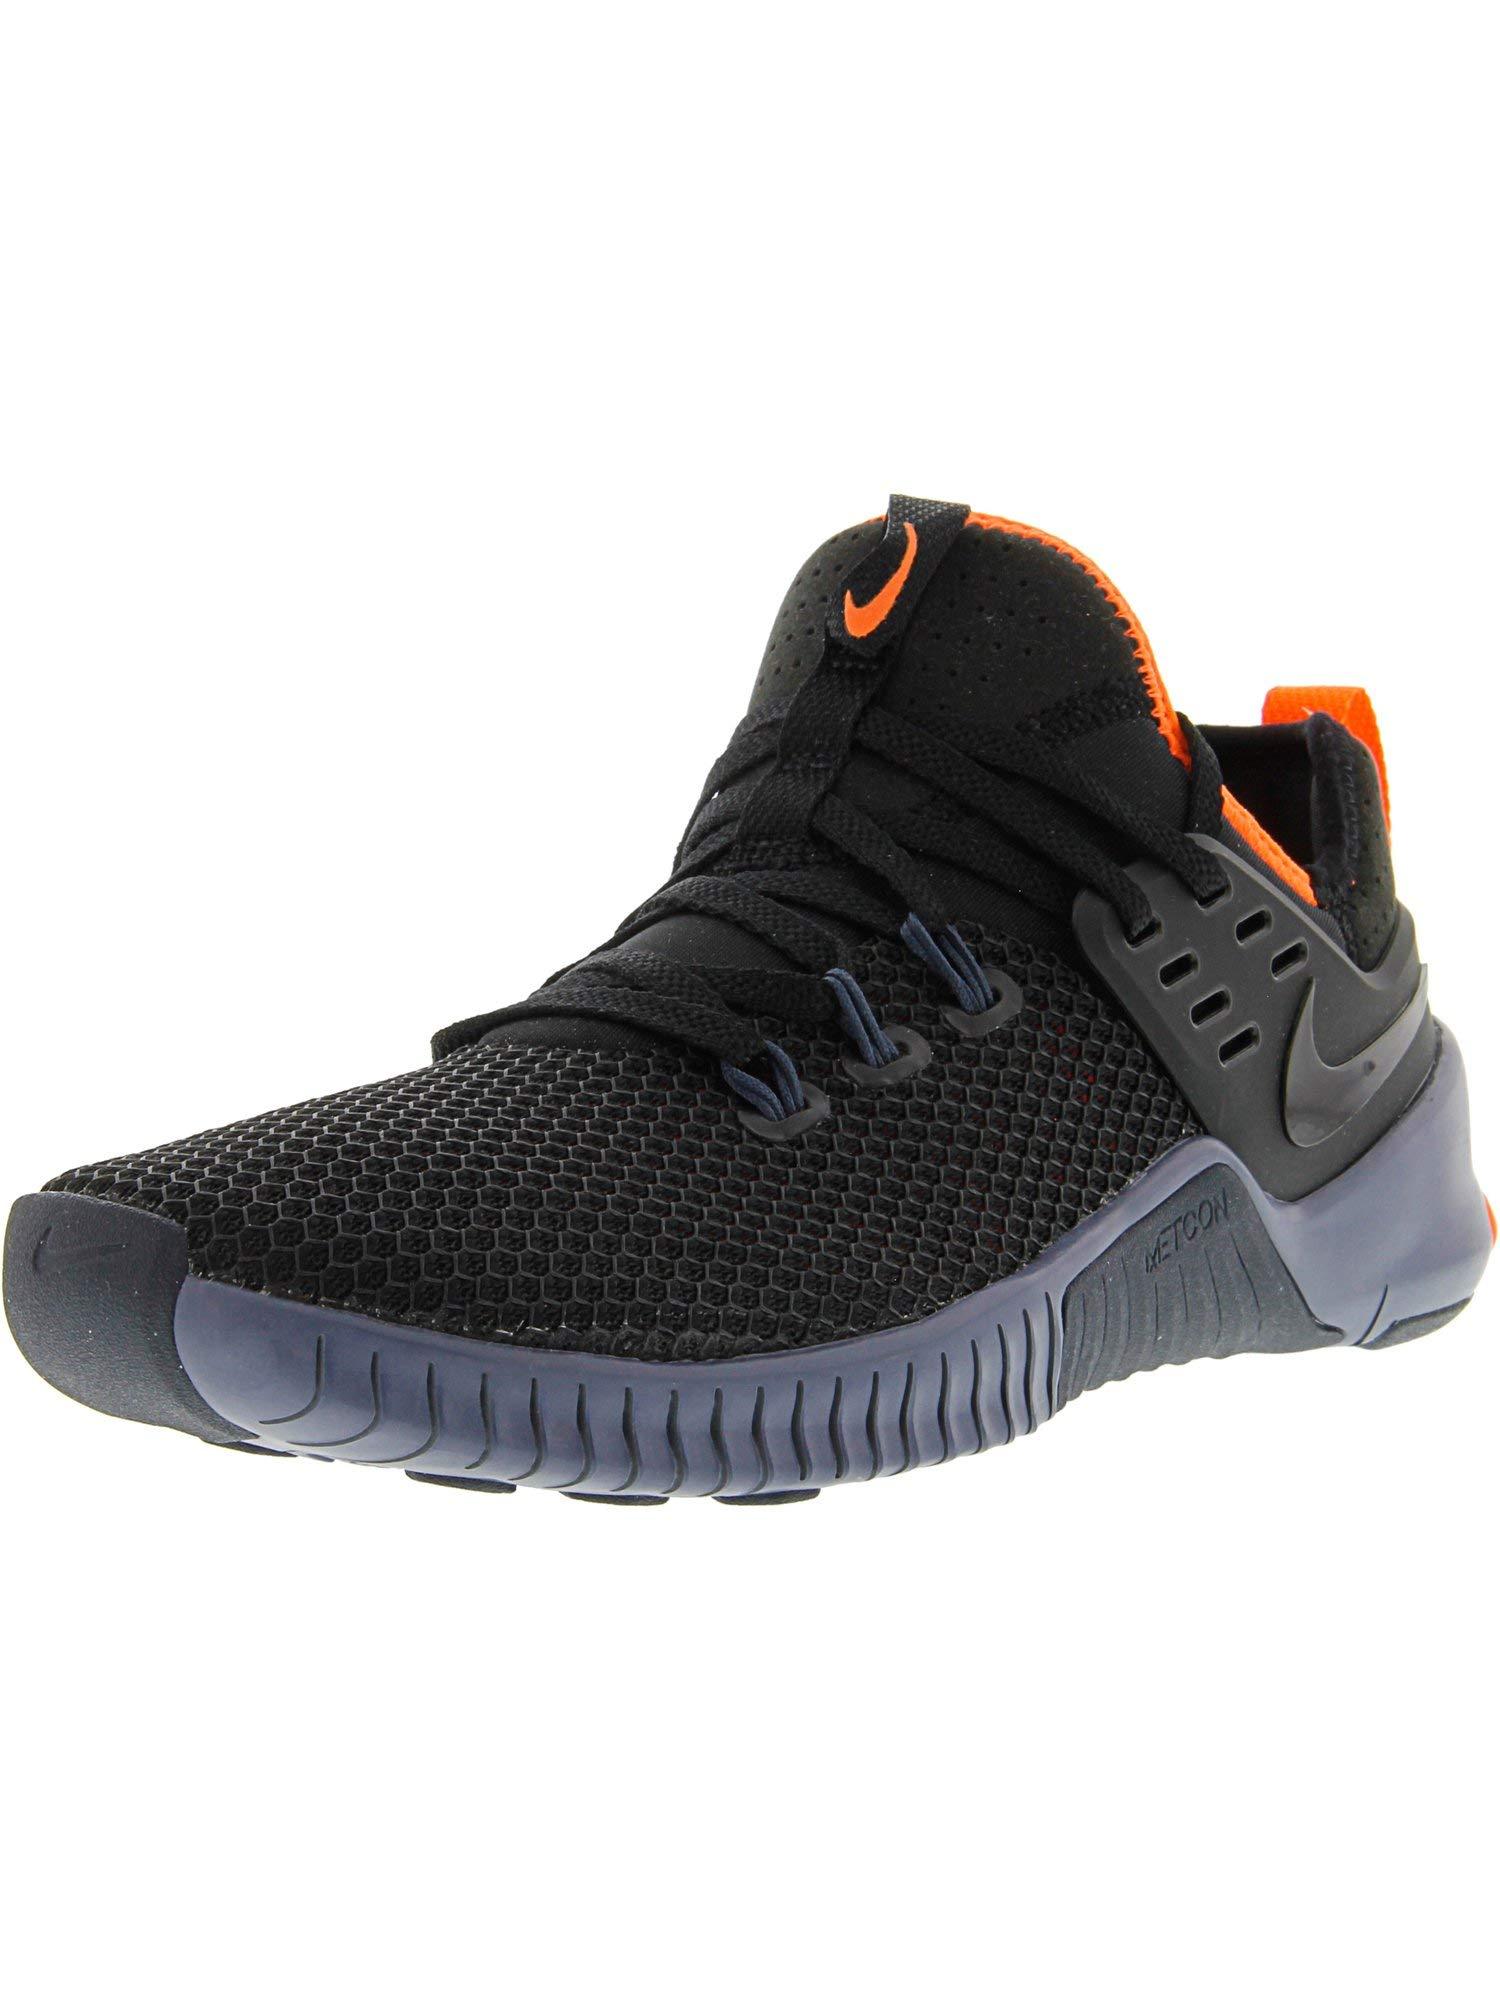 Nike Men's Free Metcon Black/Thunder Blue Ankle-High Cross Trainer Shoe - 7.5M